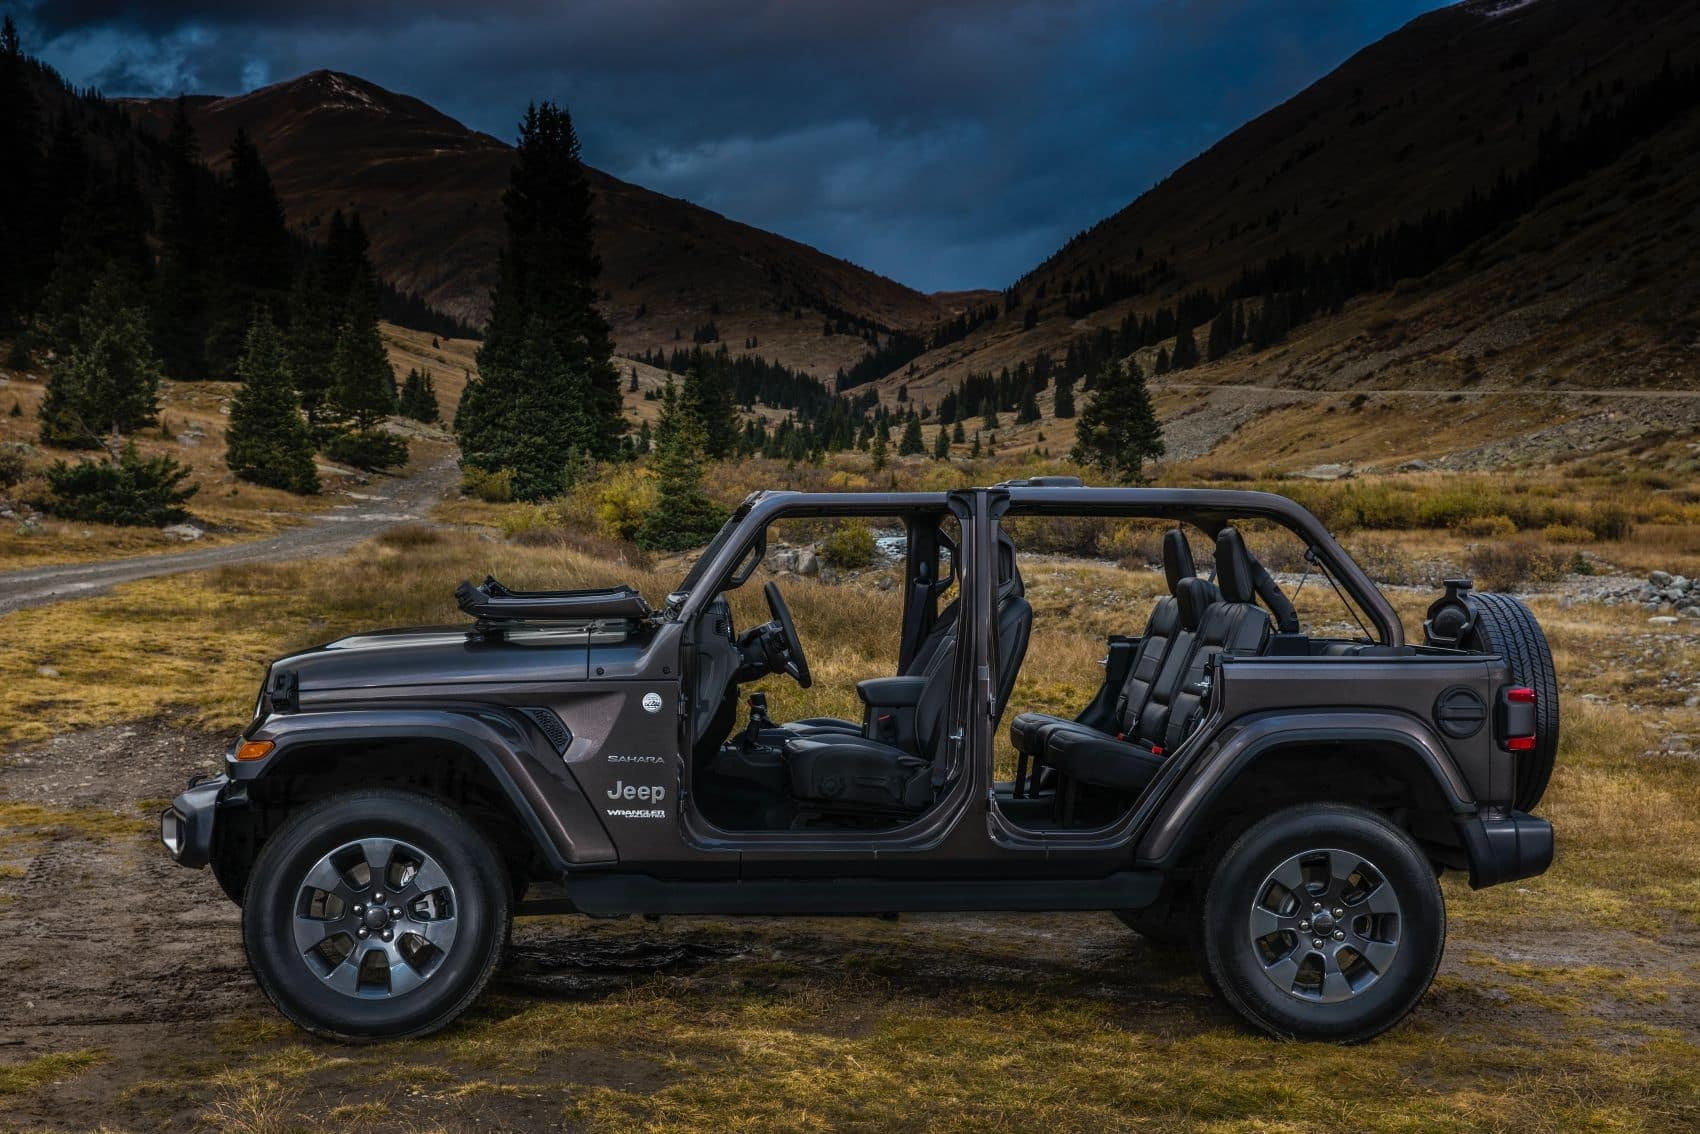 2021 Jeep Wrangler JL Unlimited Sahara Black